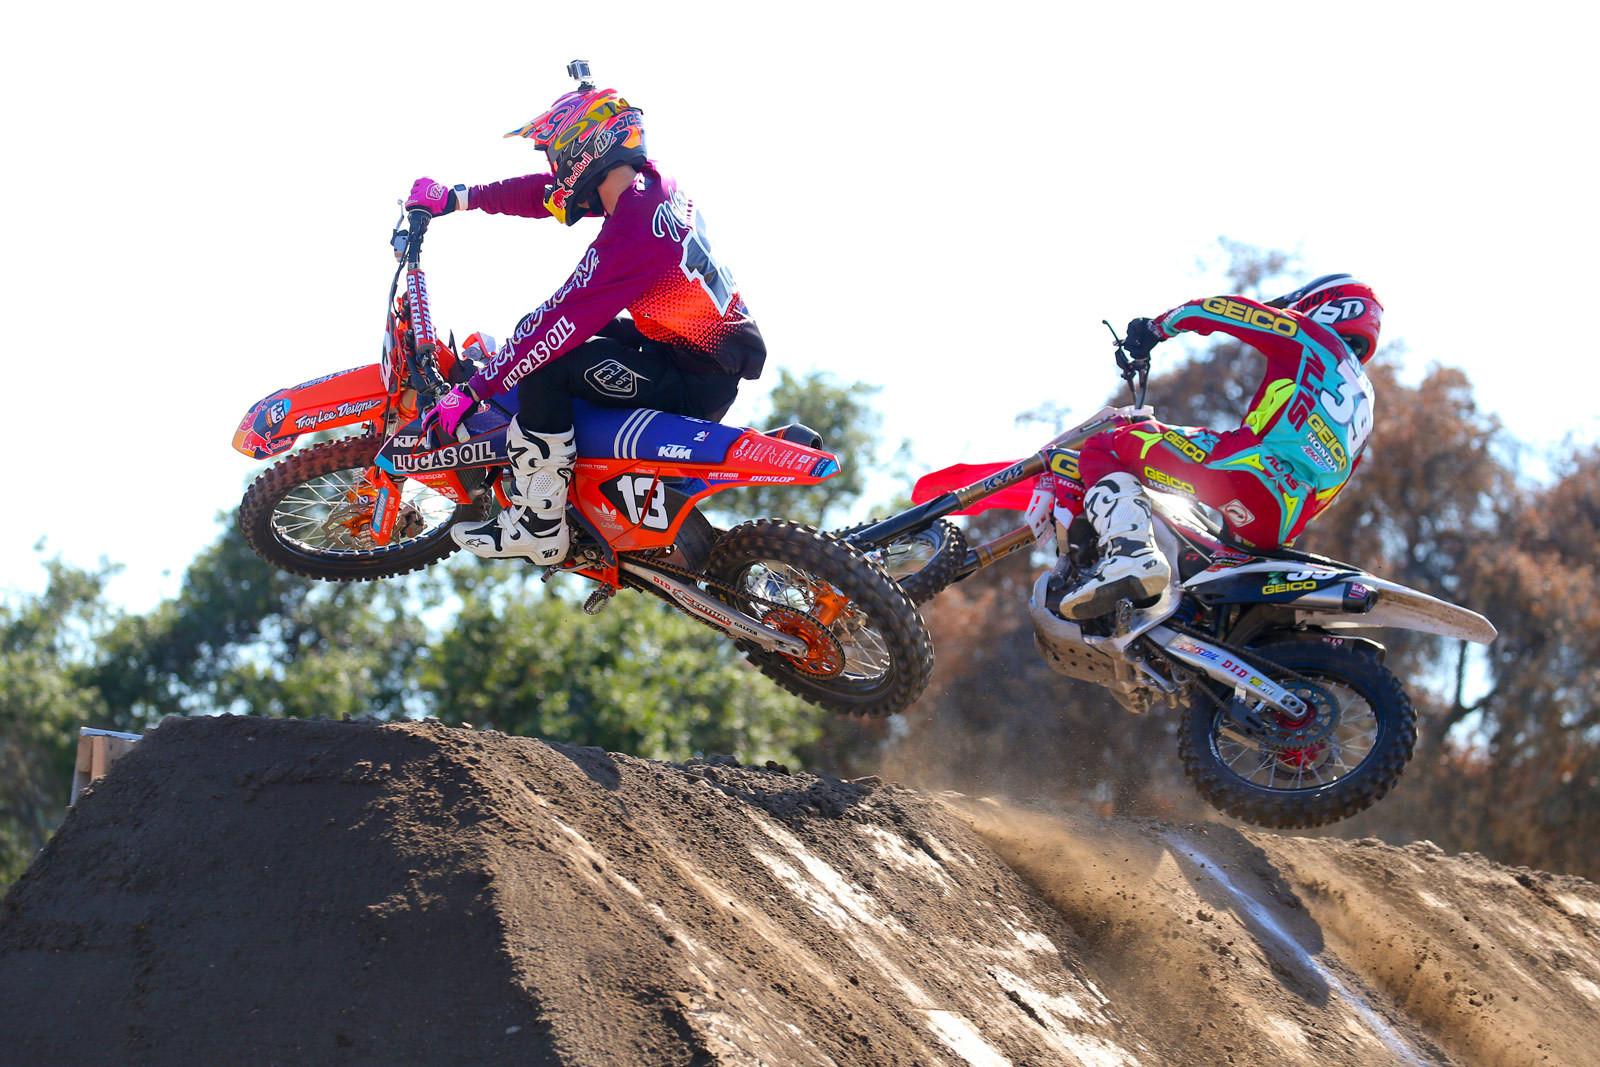 Jessy Nelson and Jordon Smith - Photo Blast: Red Bull Straight Rhythm - Motocross Pictures - Vital MX